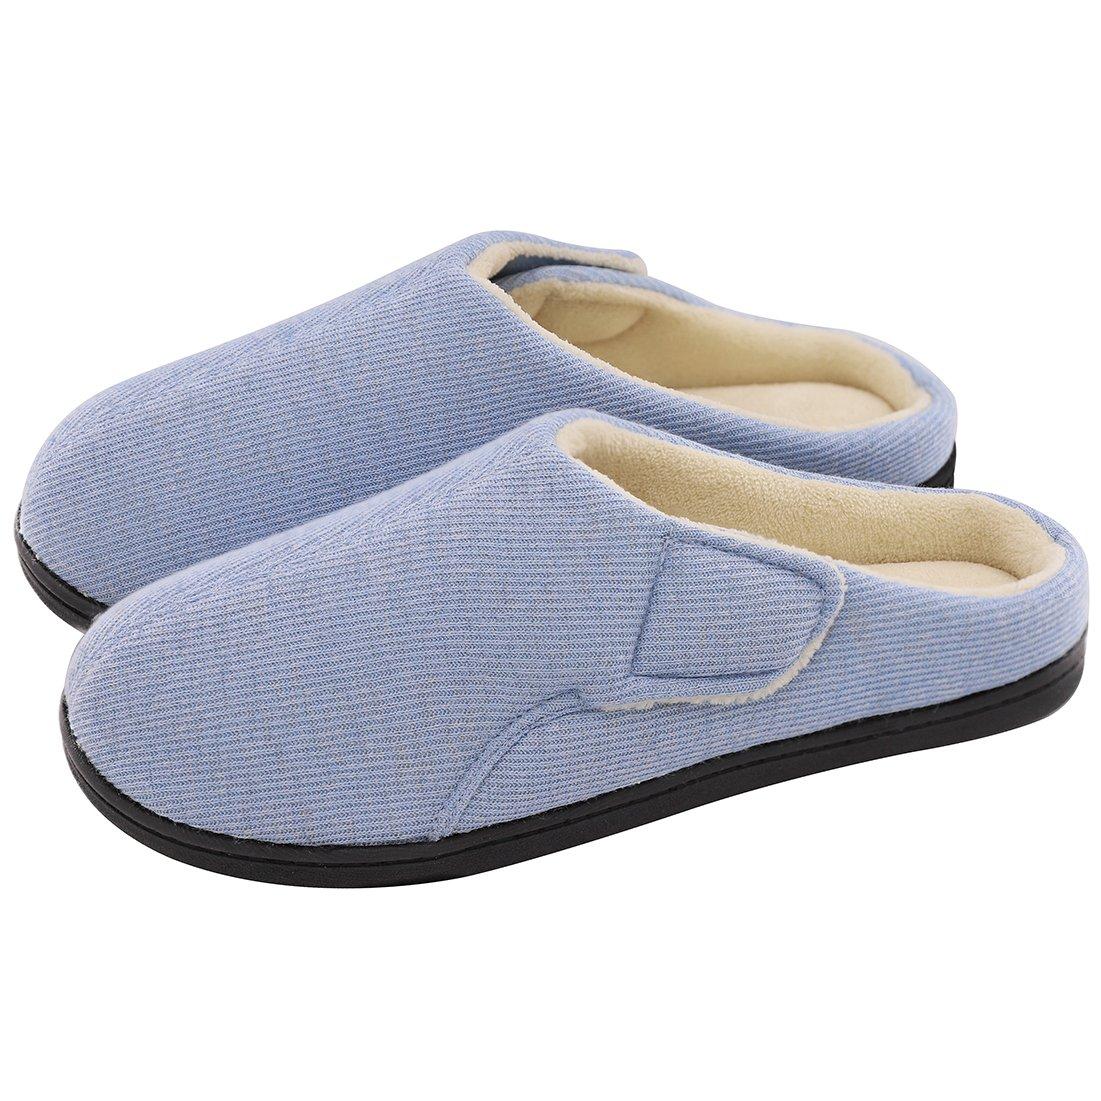 ULTRAIDEAS Women's Comfort Velvet Memory Foam Slippers Short Plush Clog Indoor & Outdoor Diabetic Shoes w/Adjustable Velcro (Large/9-10 B(M) US, Blue)